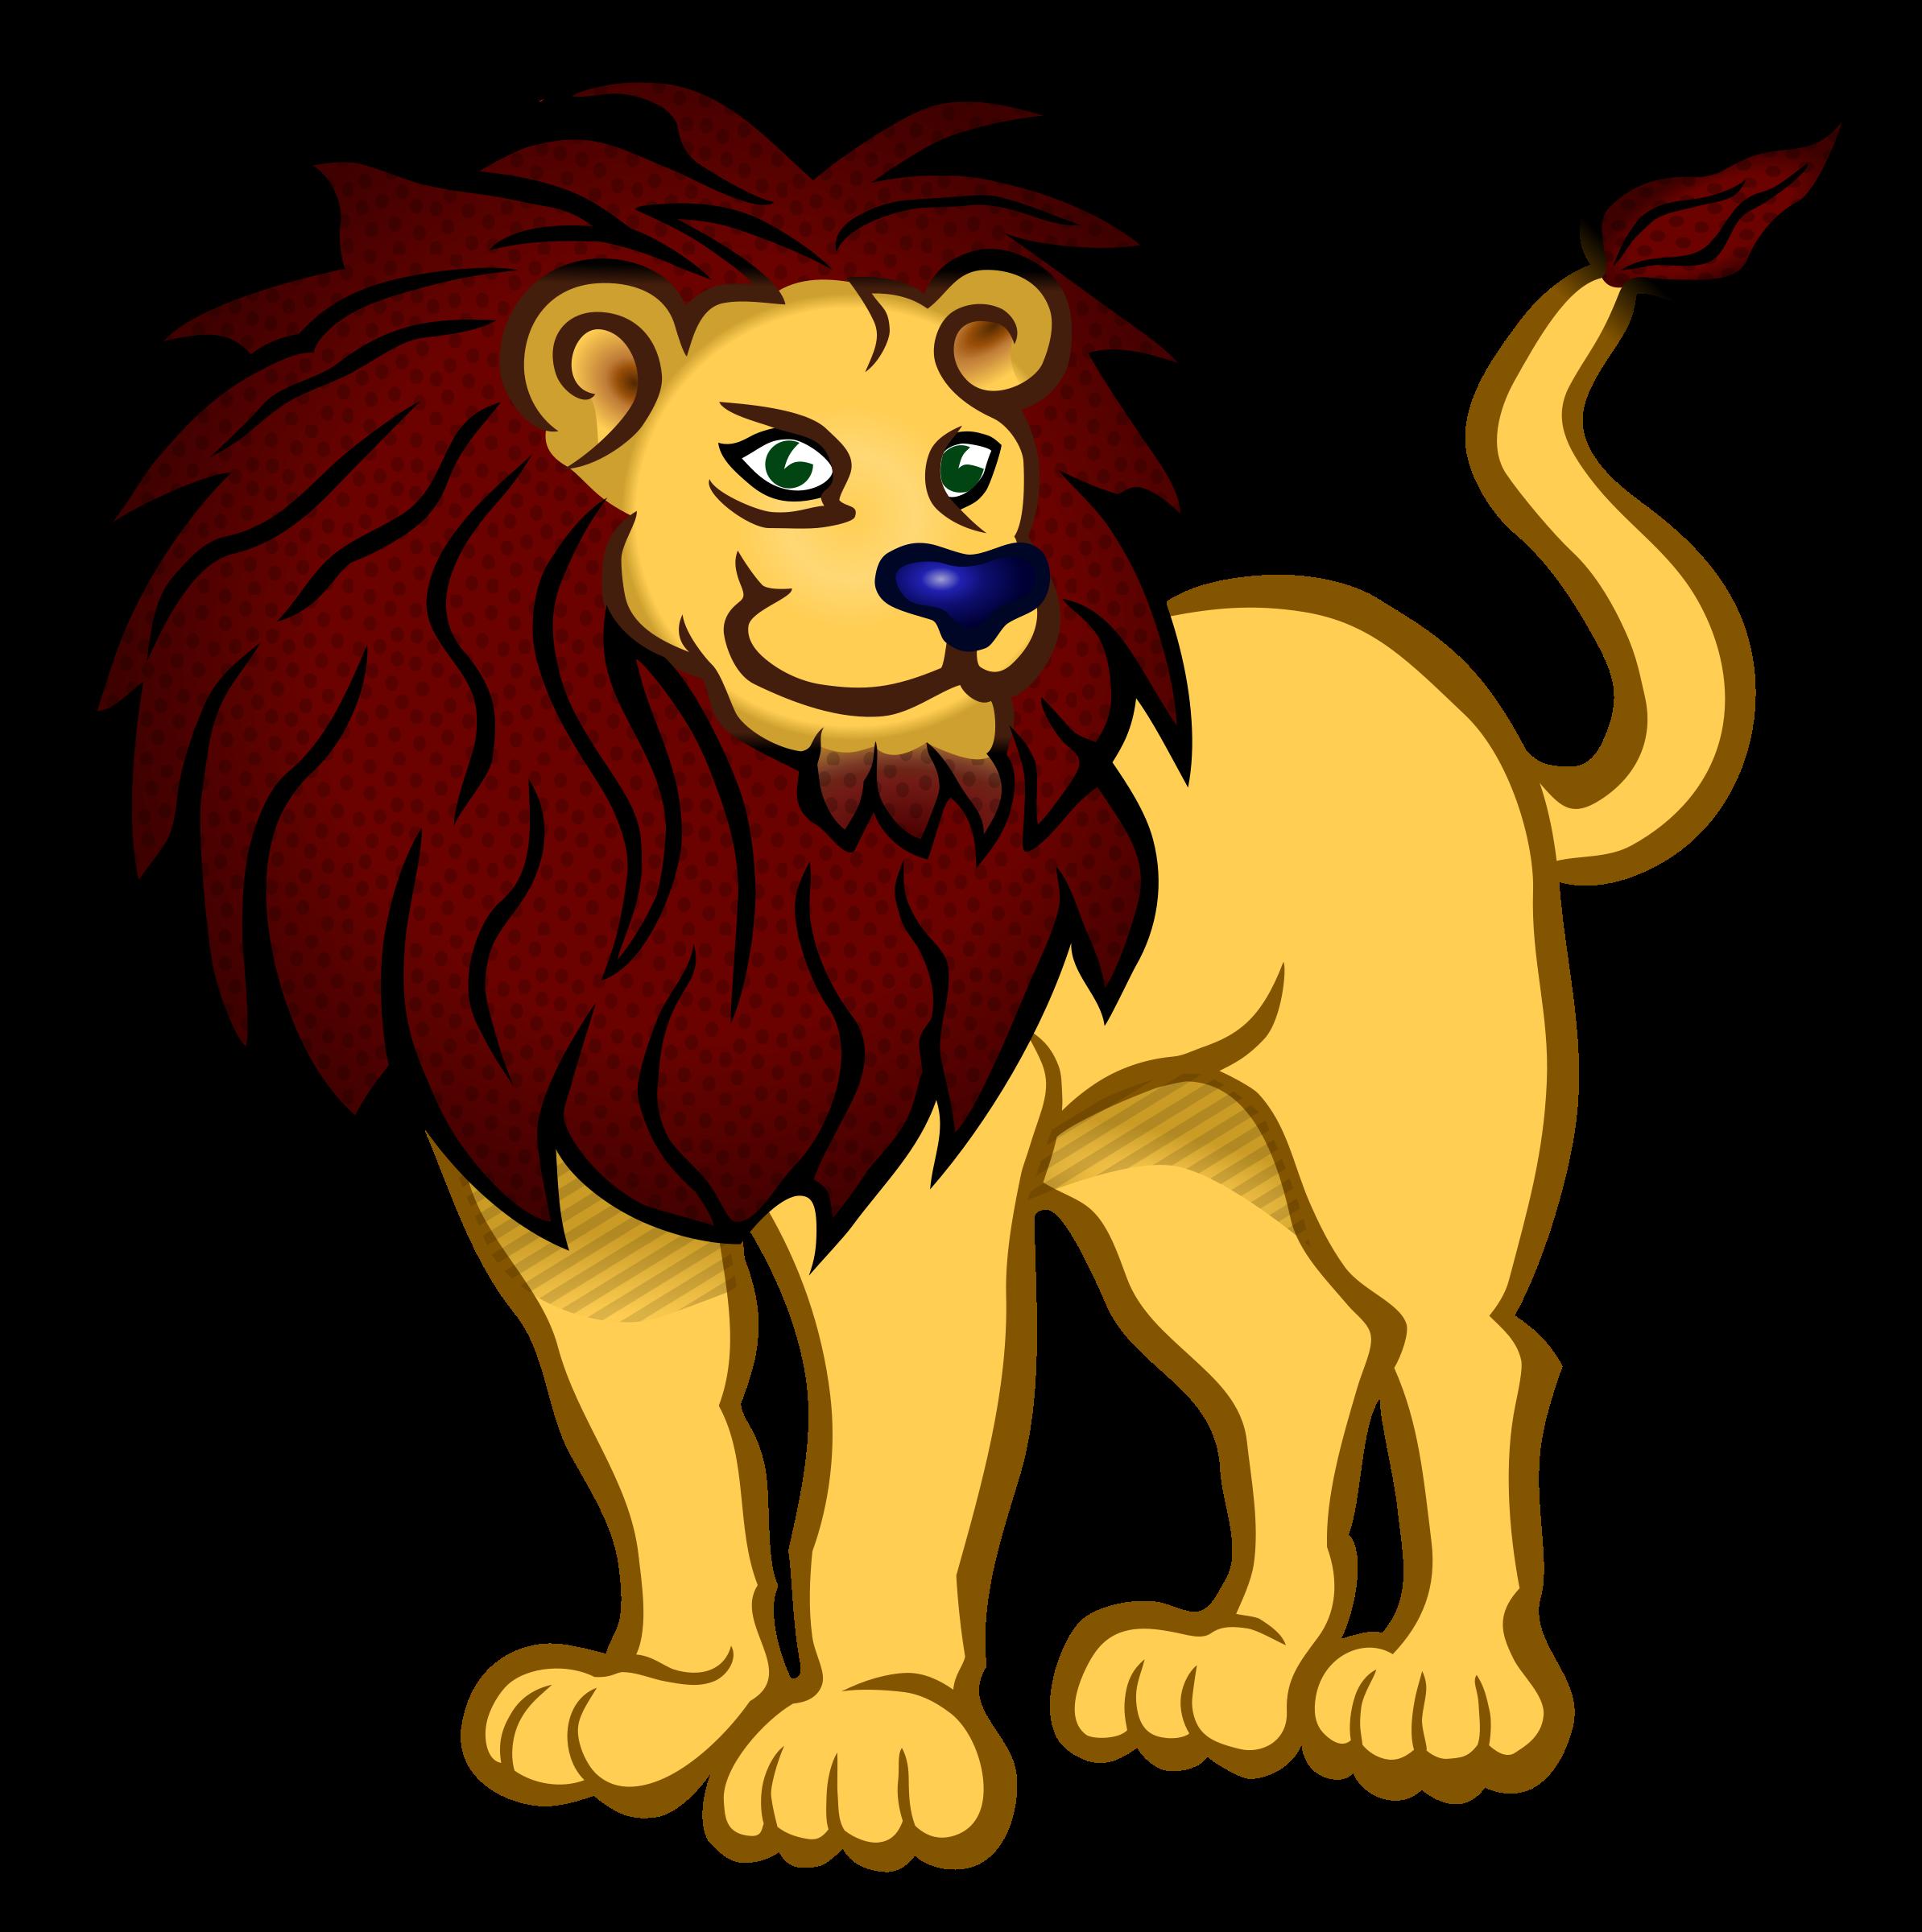 image download L clipart lion. Coloured big image png.